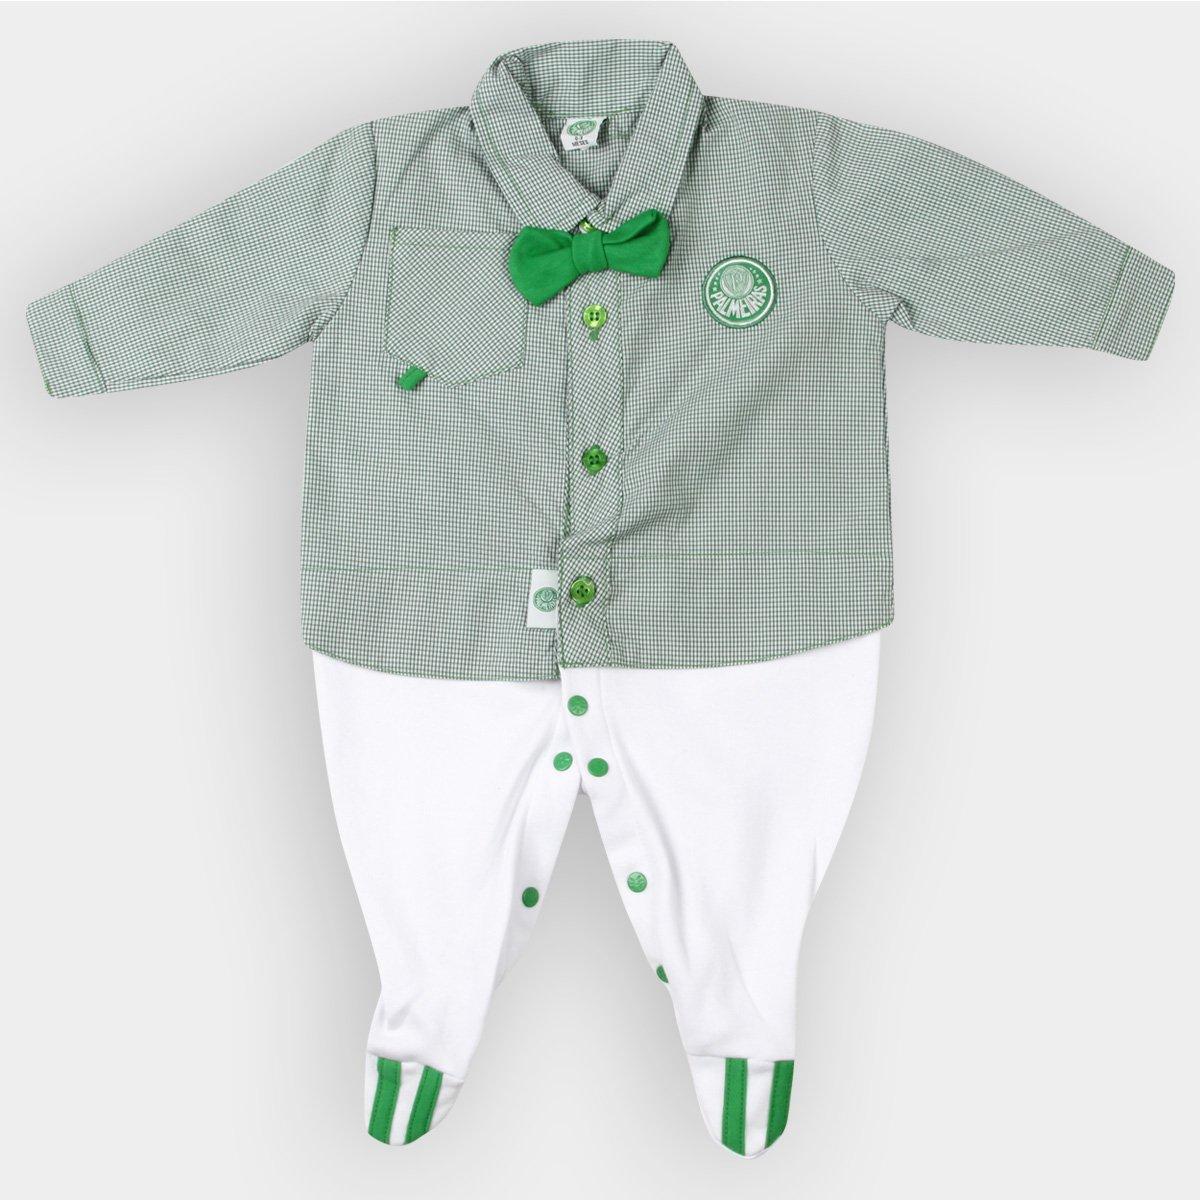 Kit Maternidade Camisa Palmeiras Bebê - Verde e Branco - Compre ... 88c68596ecc1e